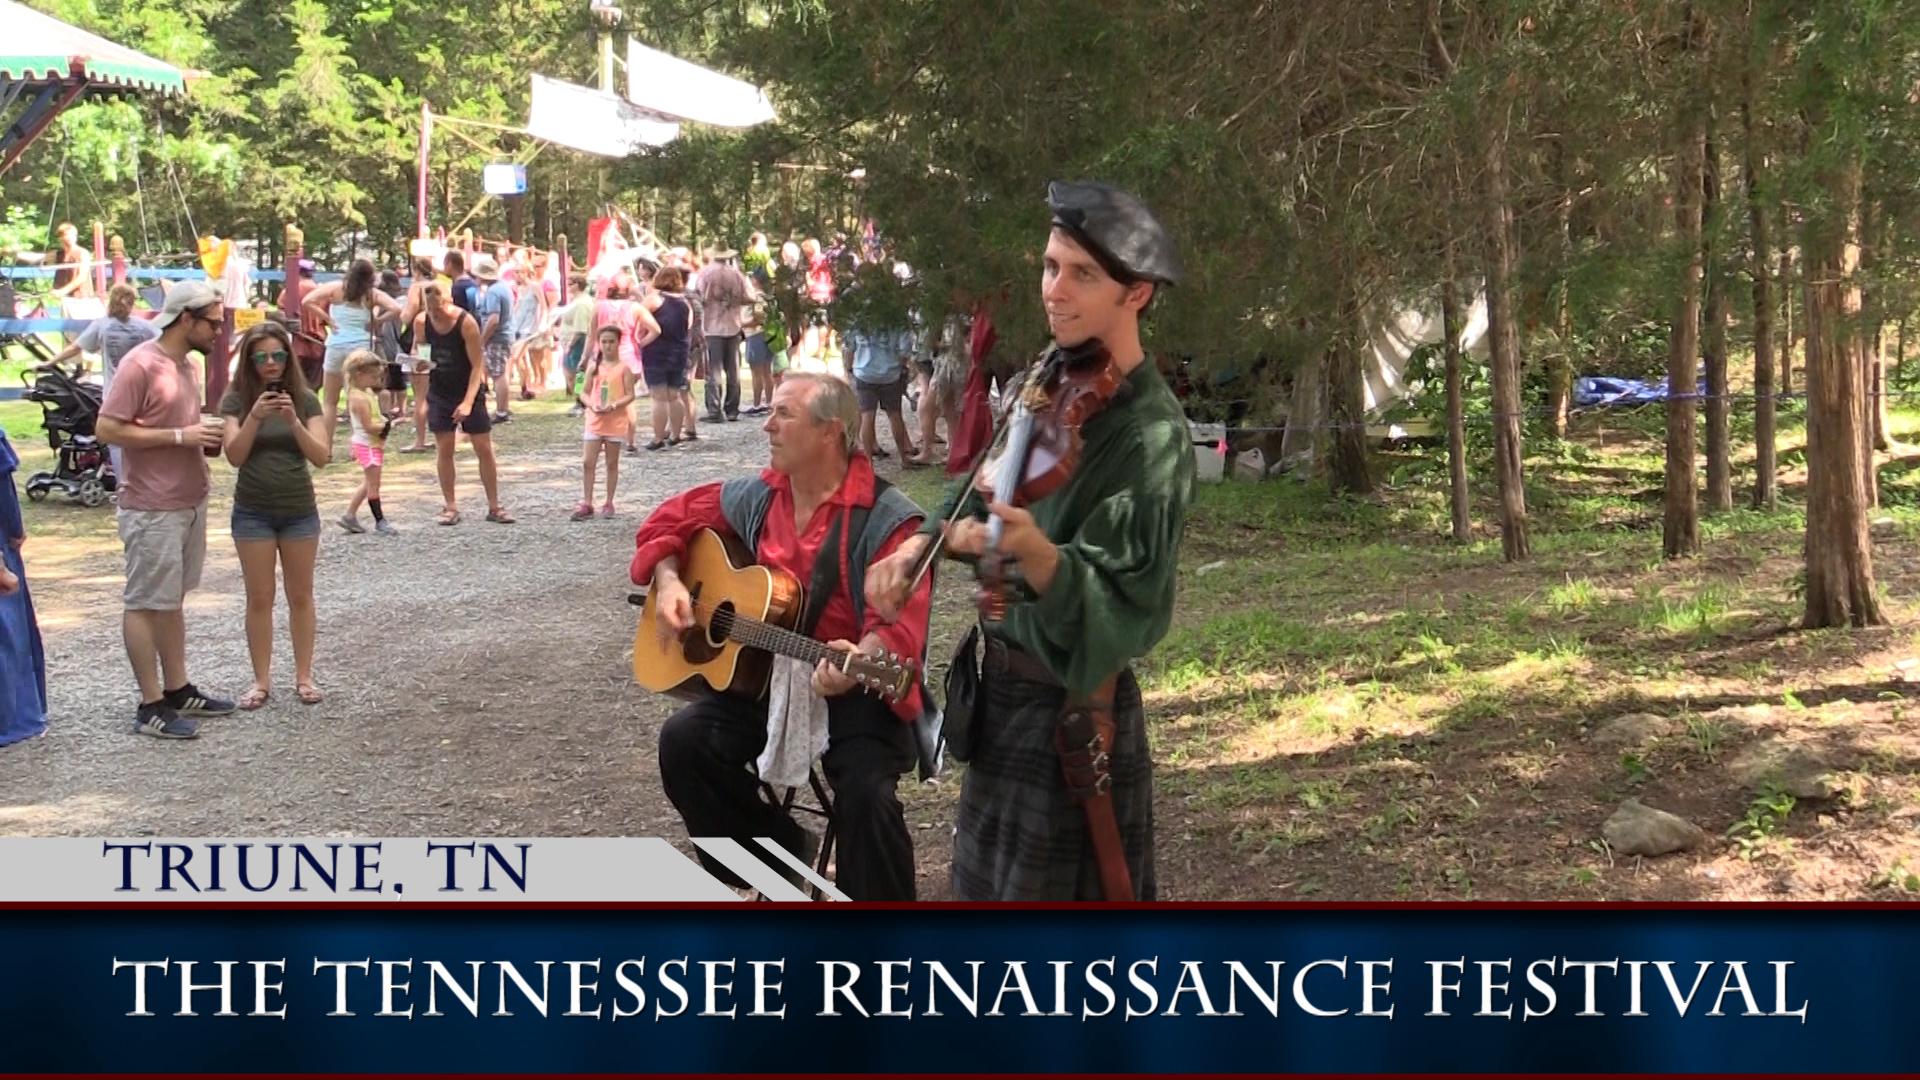 VIDEO - Scenes from TN Renaissance Festival